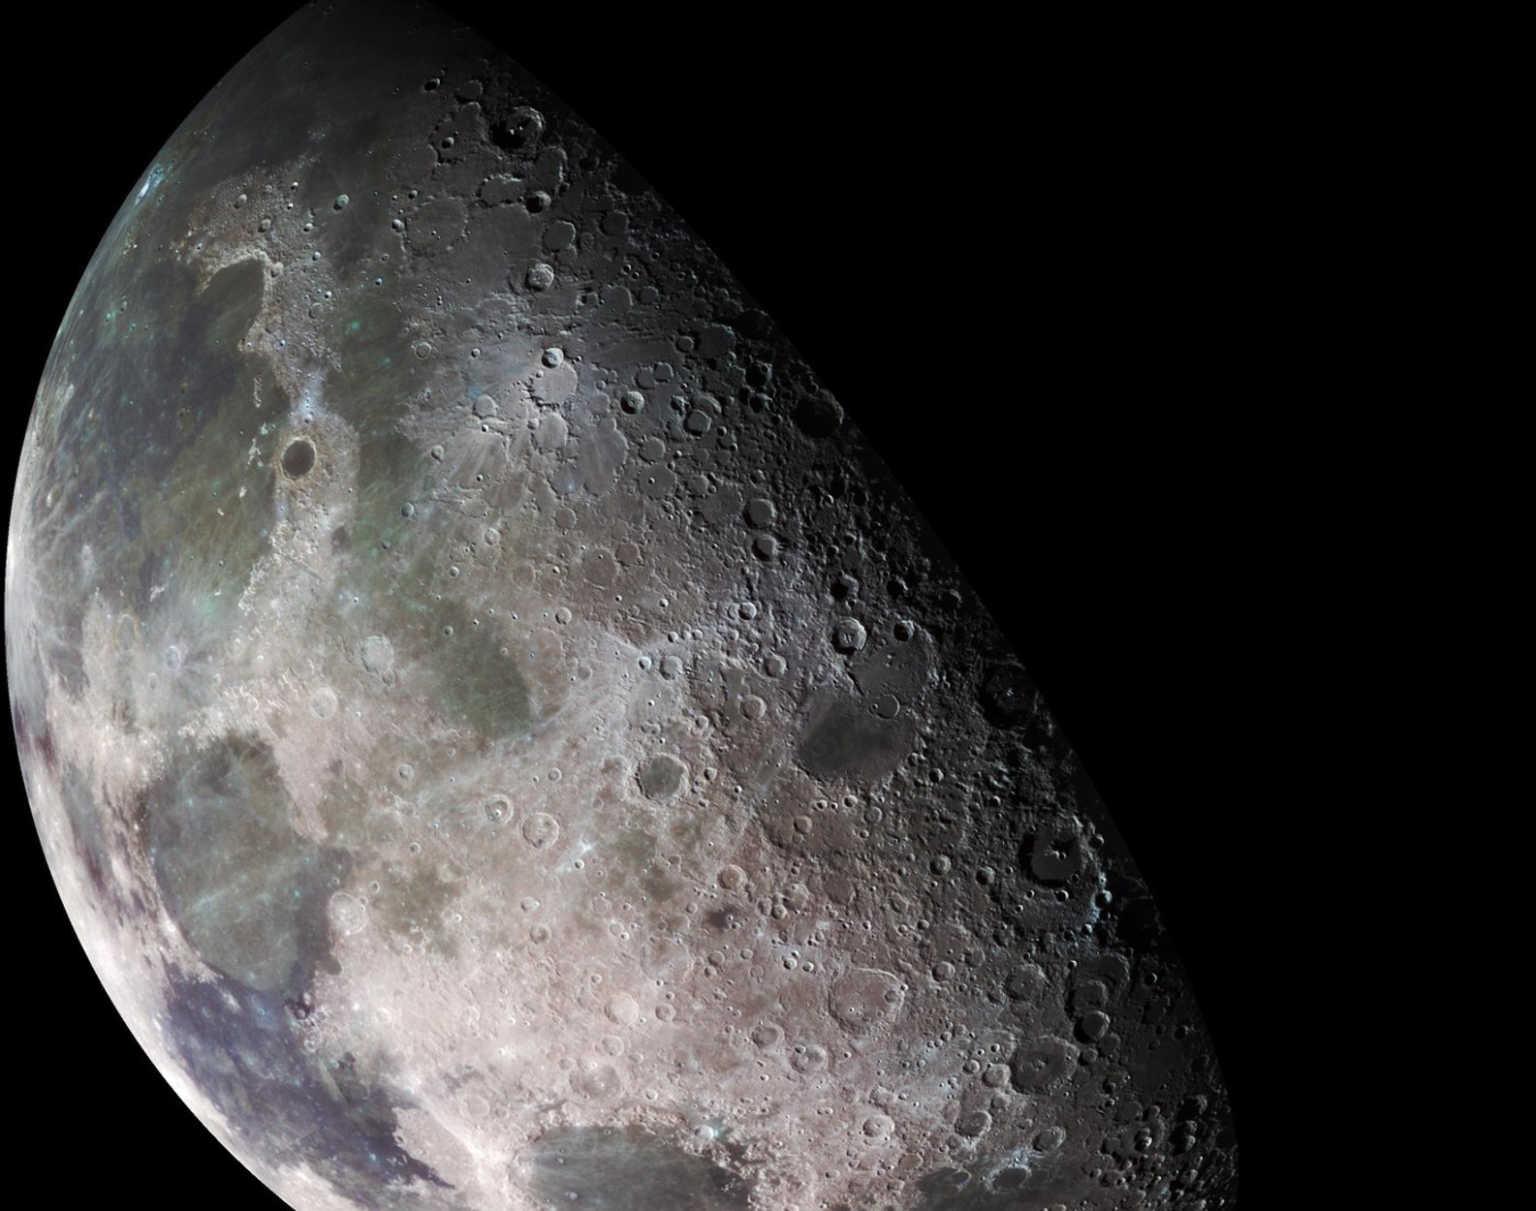 Locheed Martin και General Motors θα φτιάξουν τα επόμενα ρόβερ για την Σελήνη